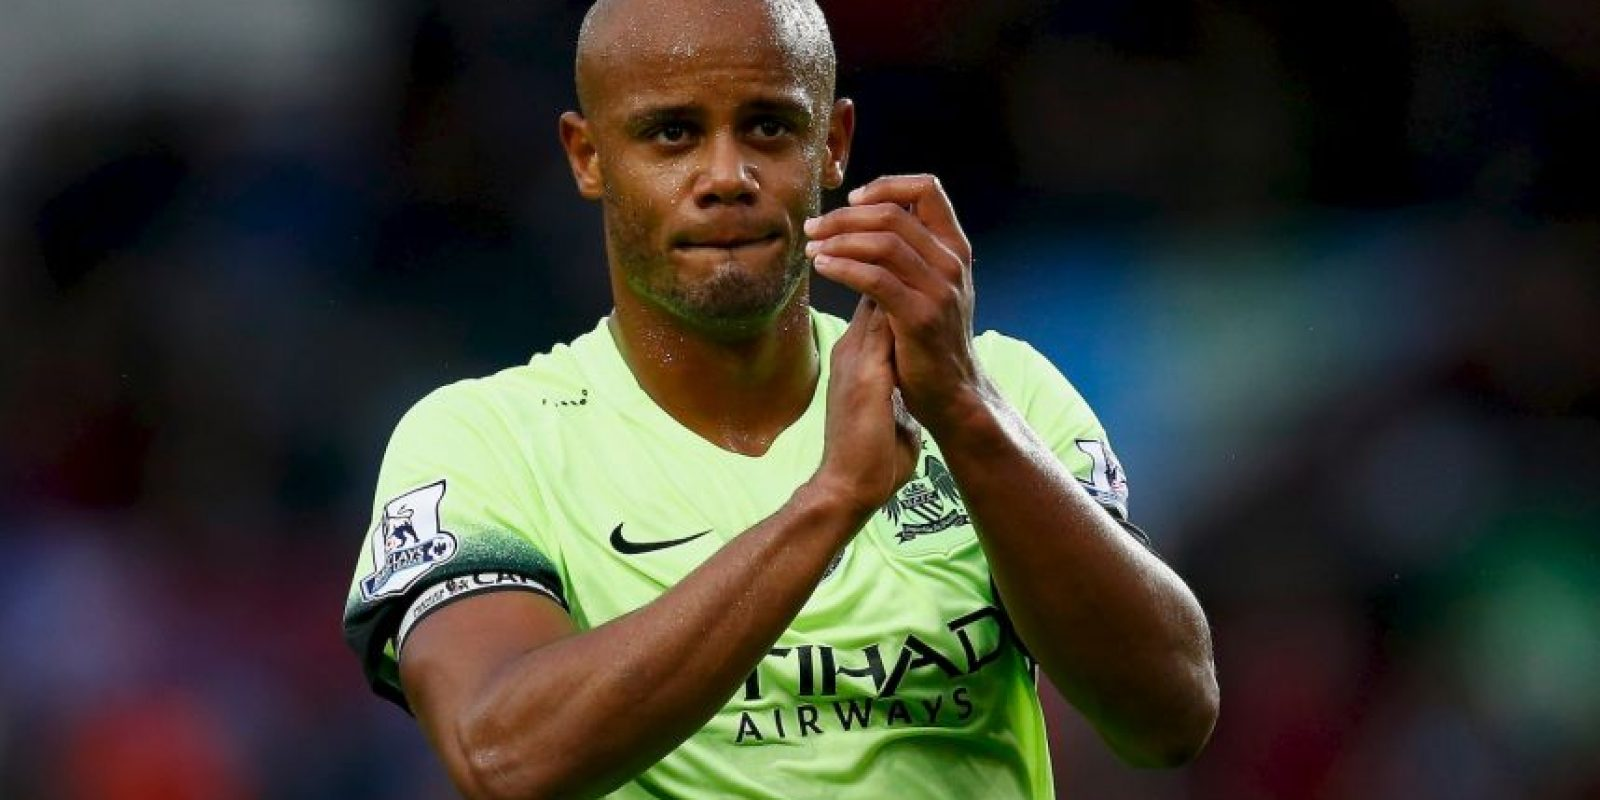 Vincent Kompany (Bçelgica, Manchester City, 29 años) Foto:Getty Images